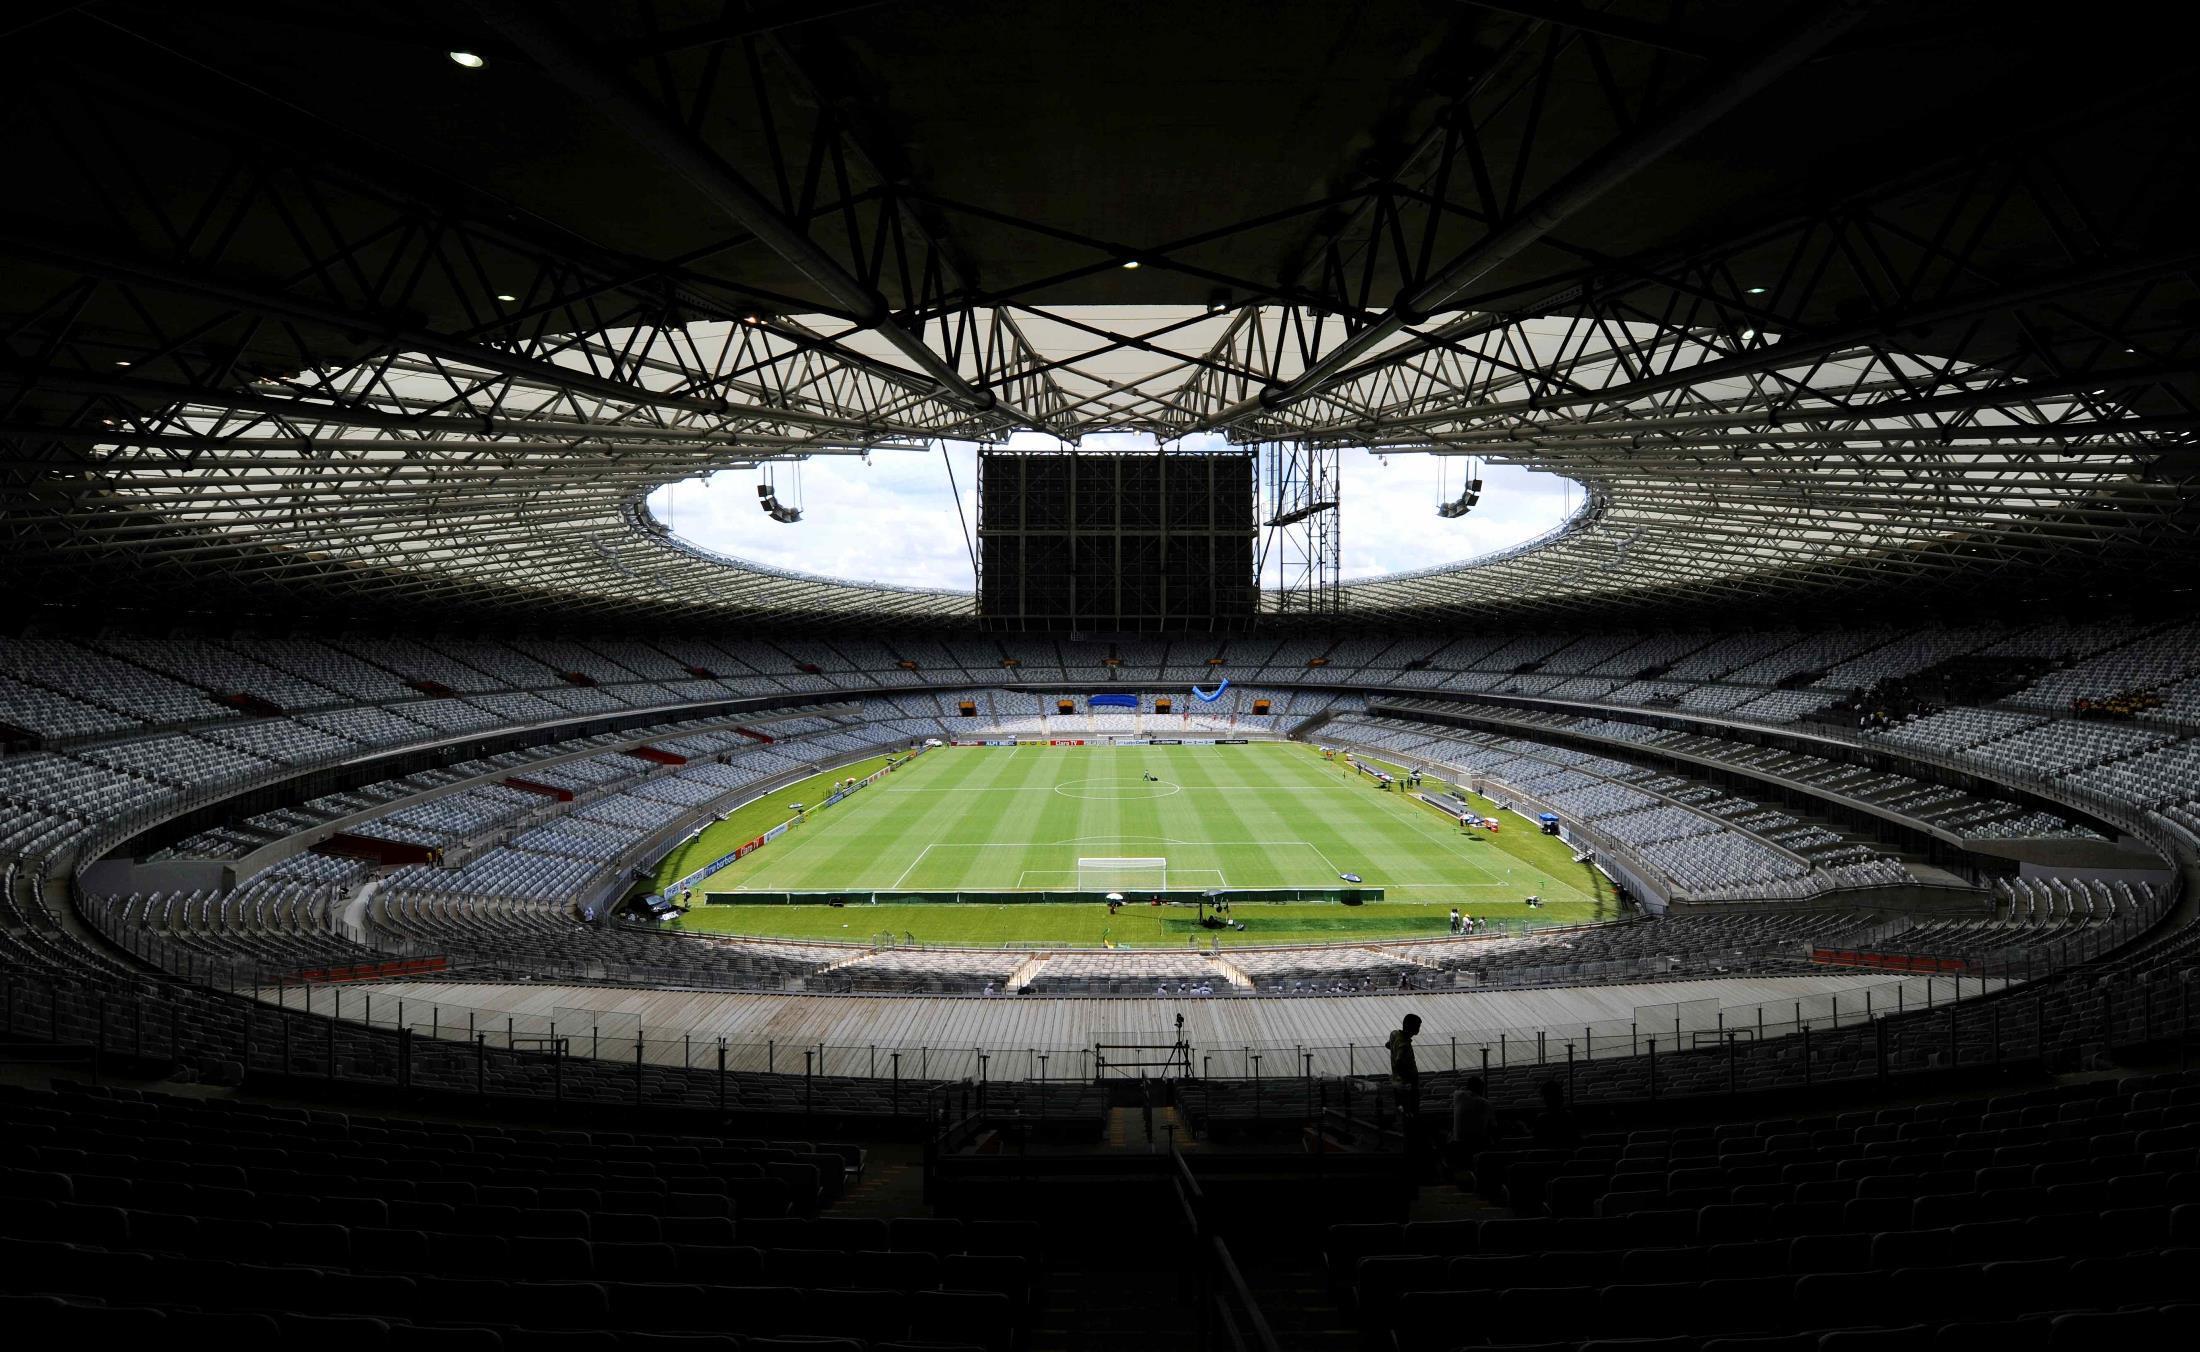 estadio-mineirao_belo-horizonte_demie-finale